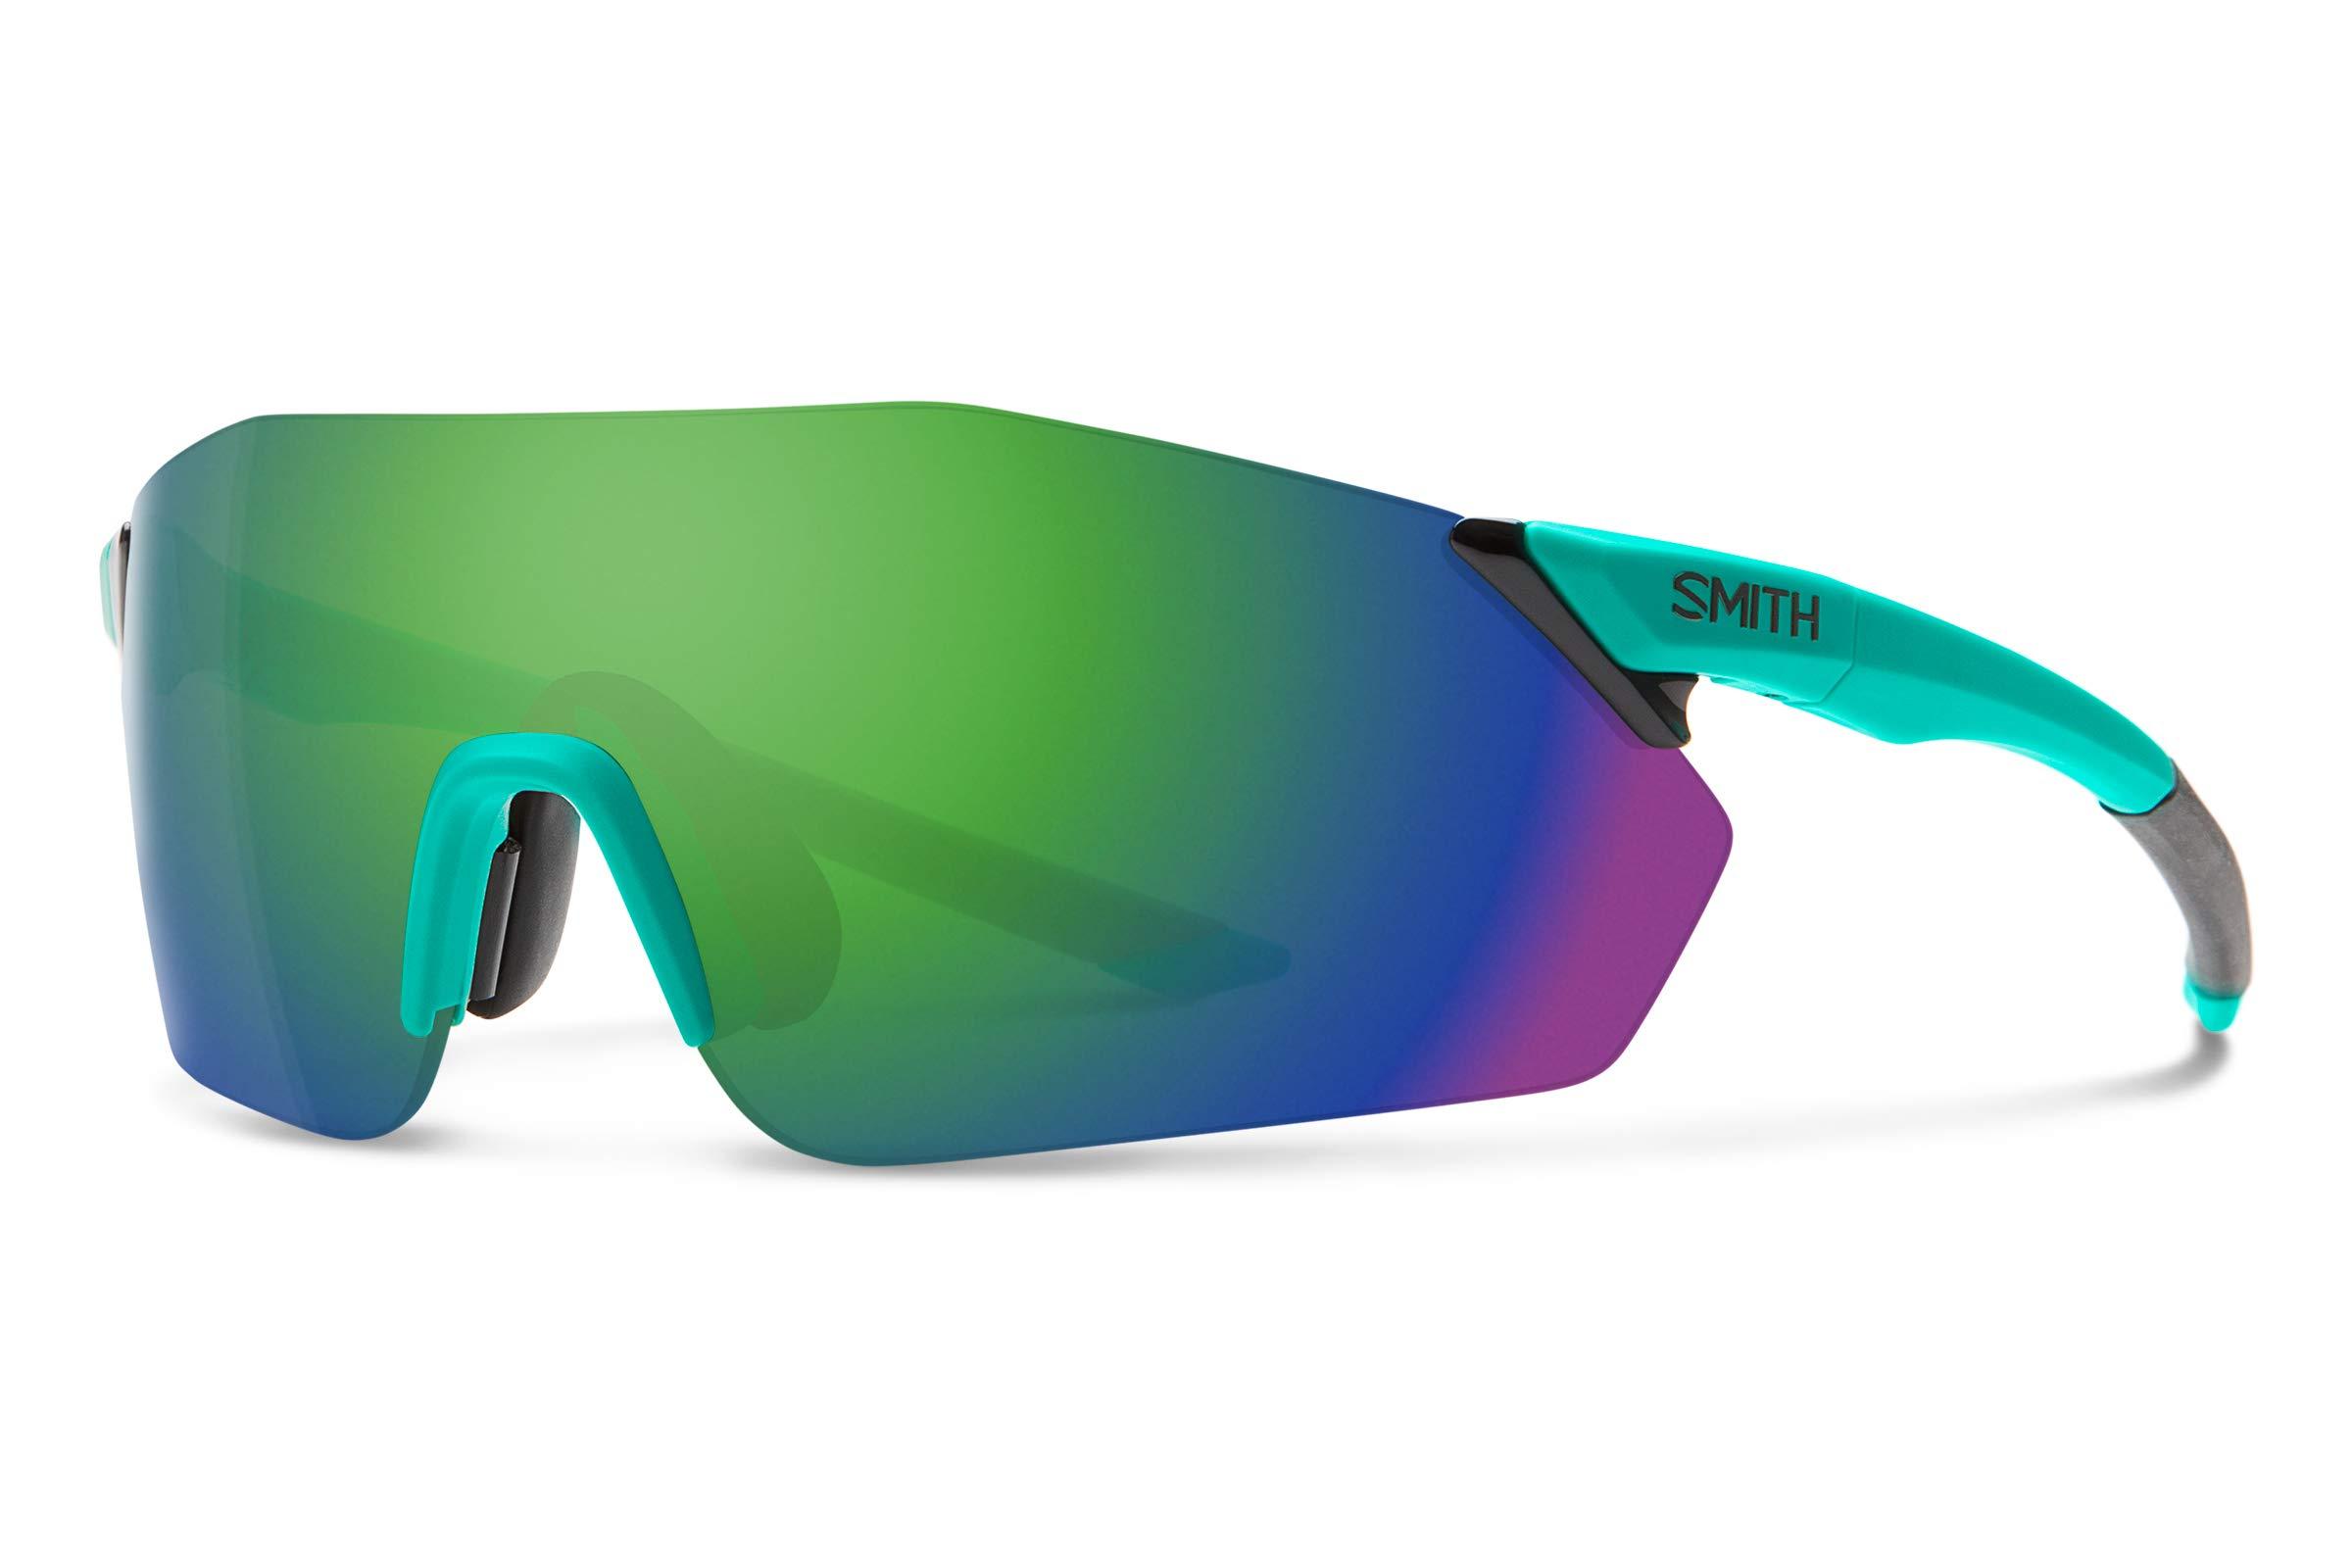 Smith Reverb Chromapop Sunglasses, Matte Jade, Chromapop Sun Green Mirror/Contrast Rose